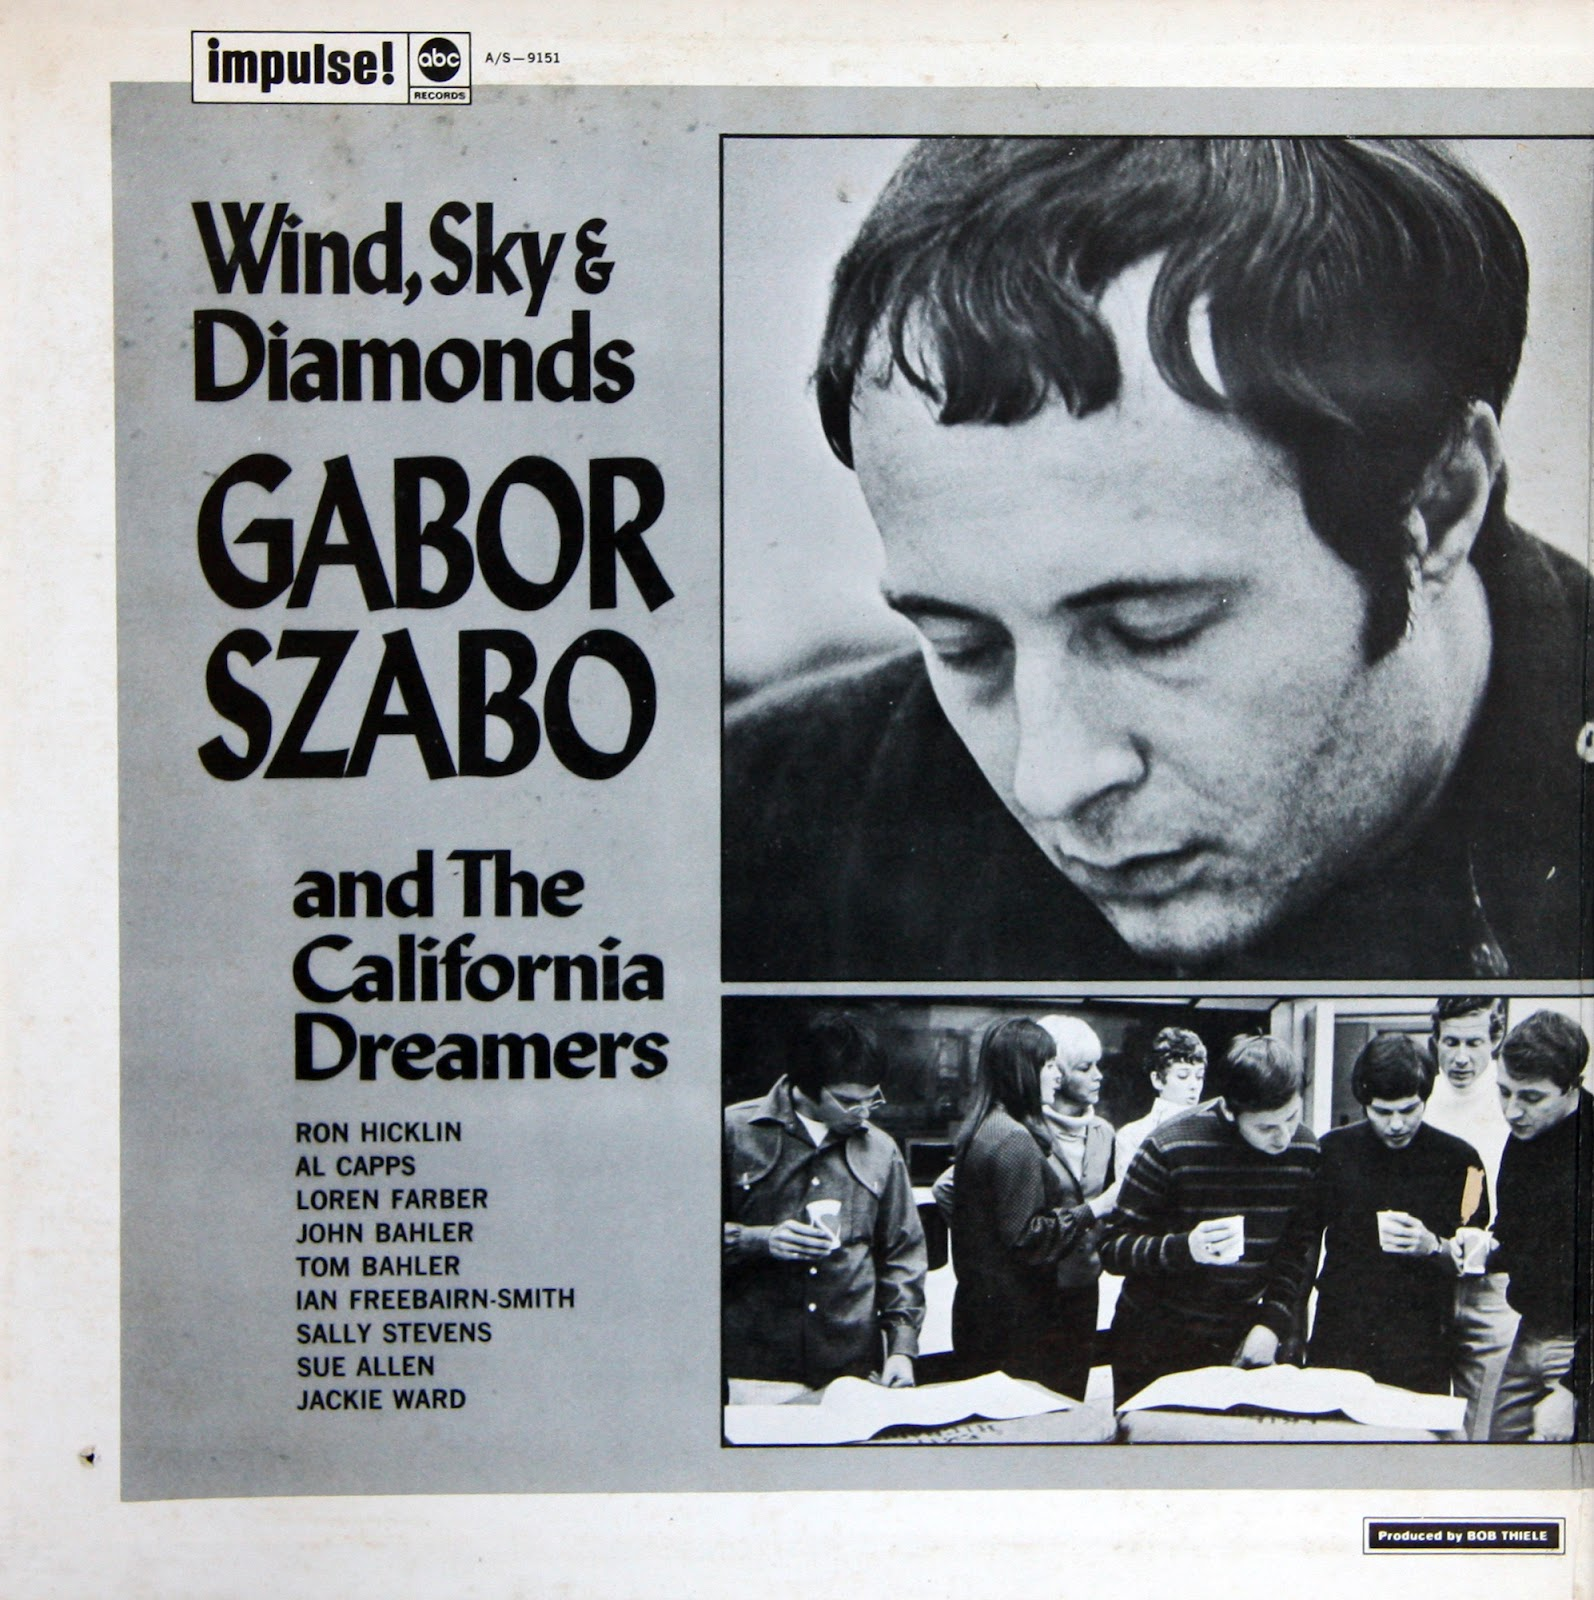 gabor szabo discography download